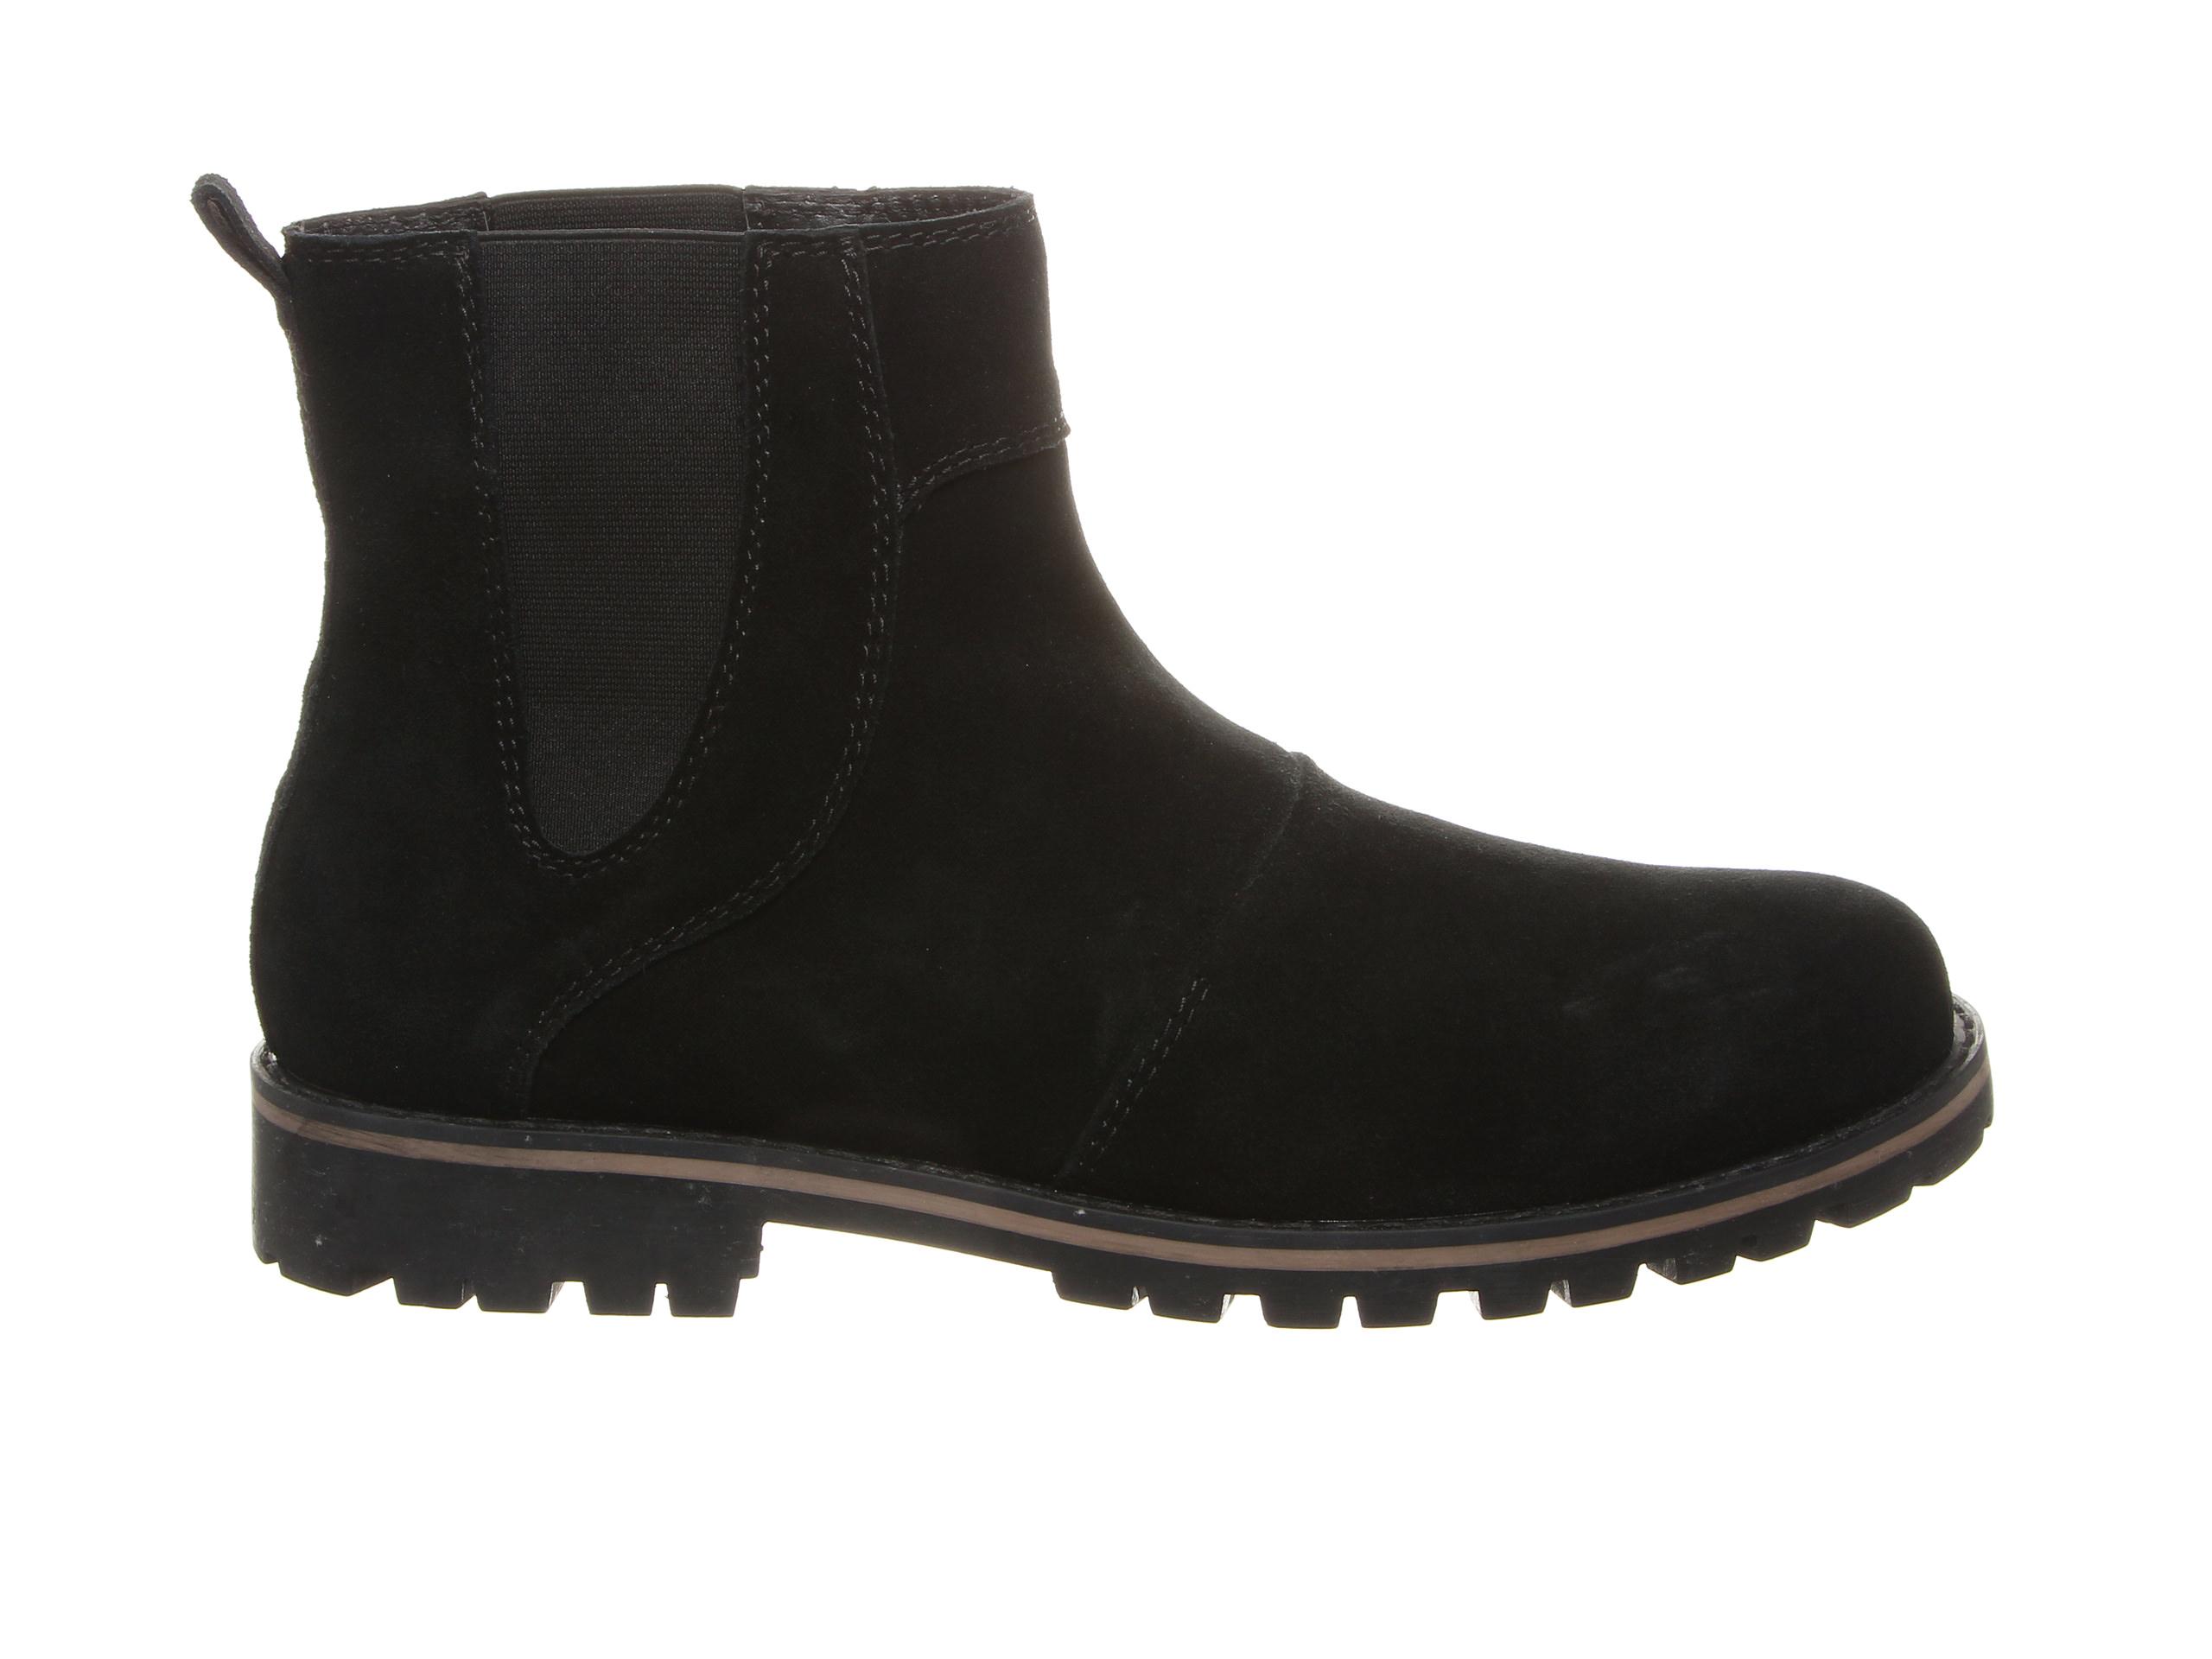 Bearpaw Alastair Men's Boots (Black Suede)